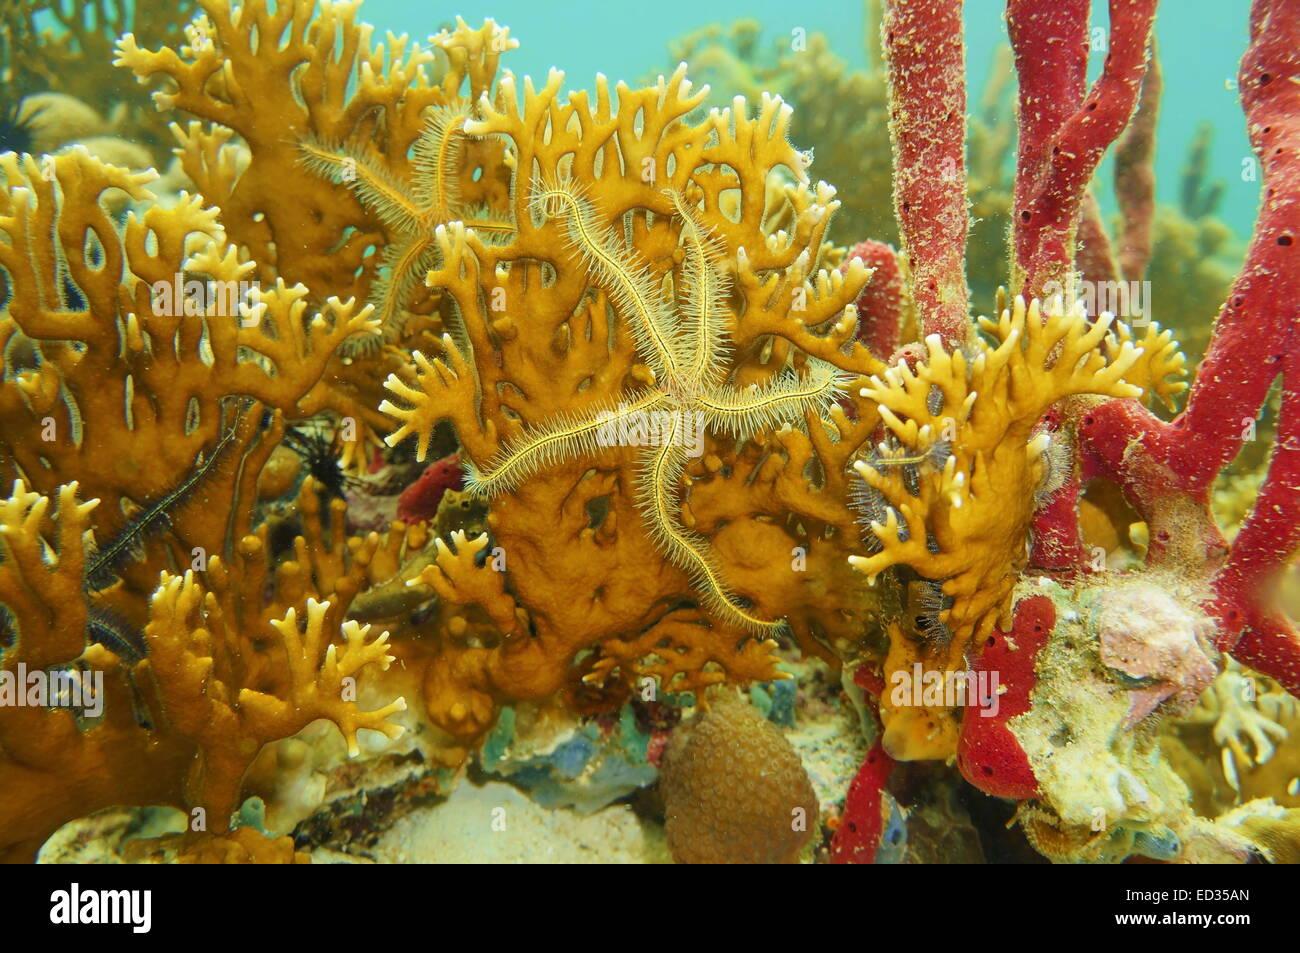 Underwater creature, Suenson's brittle star on branching fire coral, Caribbean sea - Stock Image